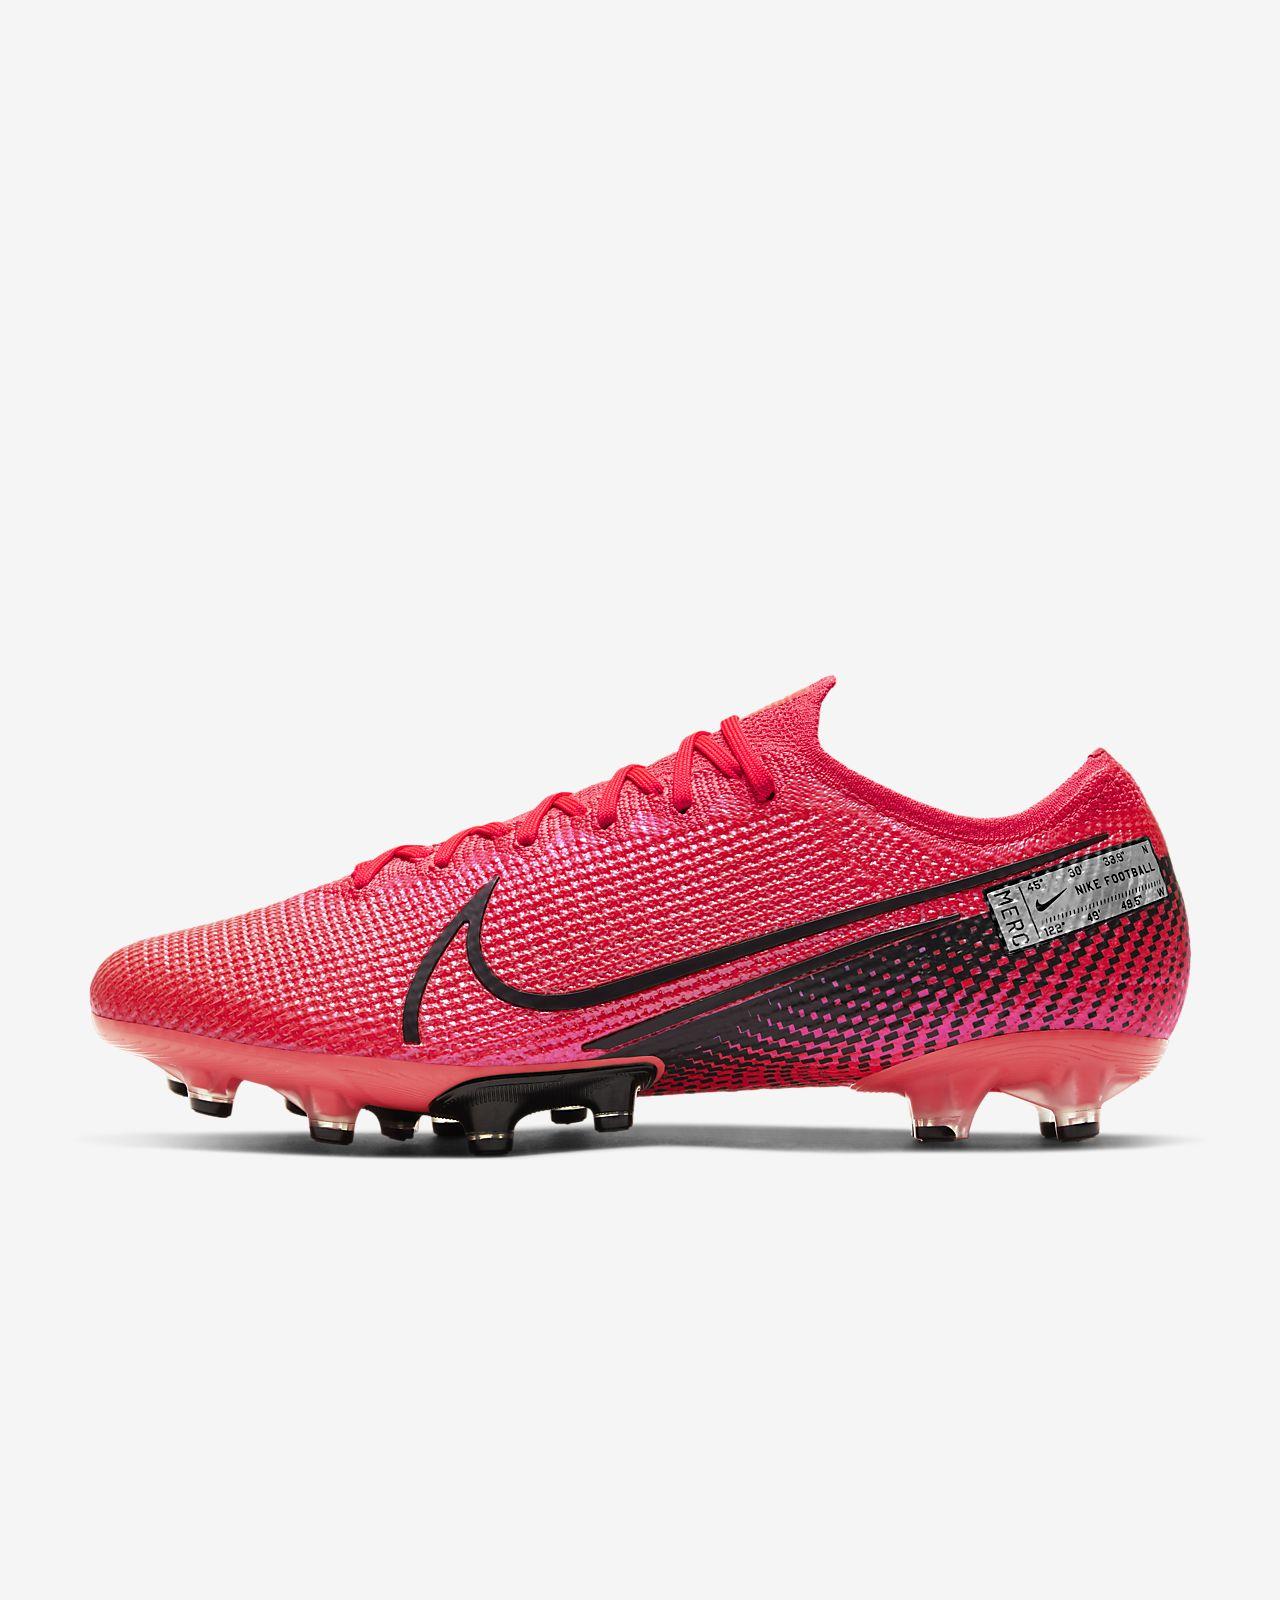 Nike Mercurial Vapor 13 Elite AG-PRO Fußballschuh für Kunstrasen